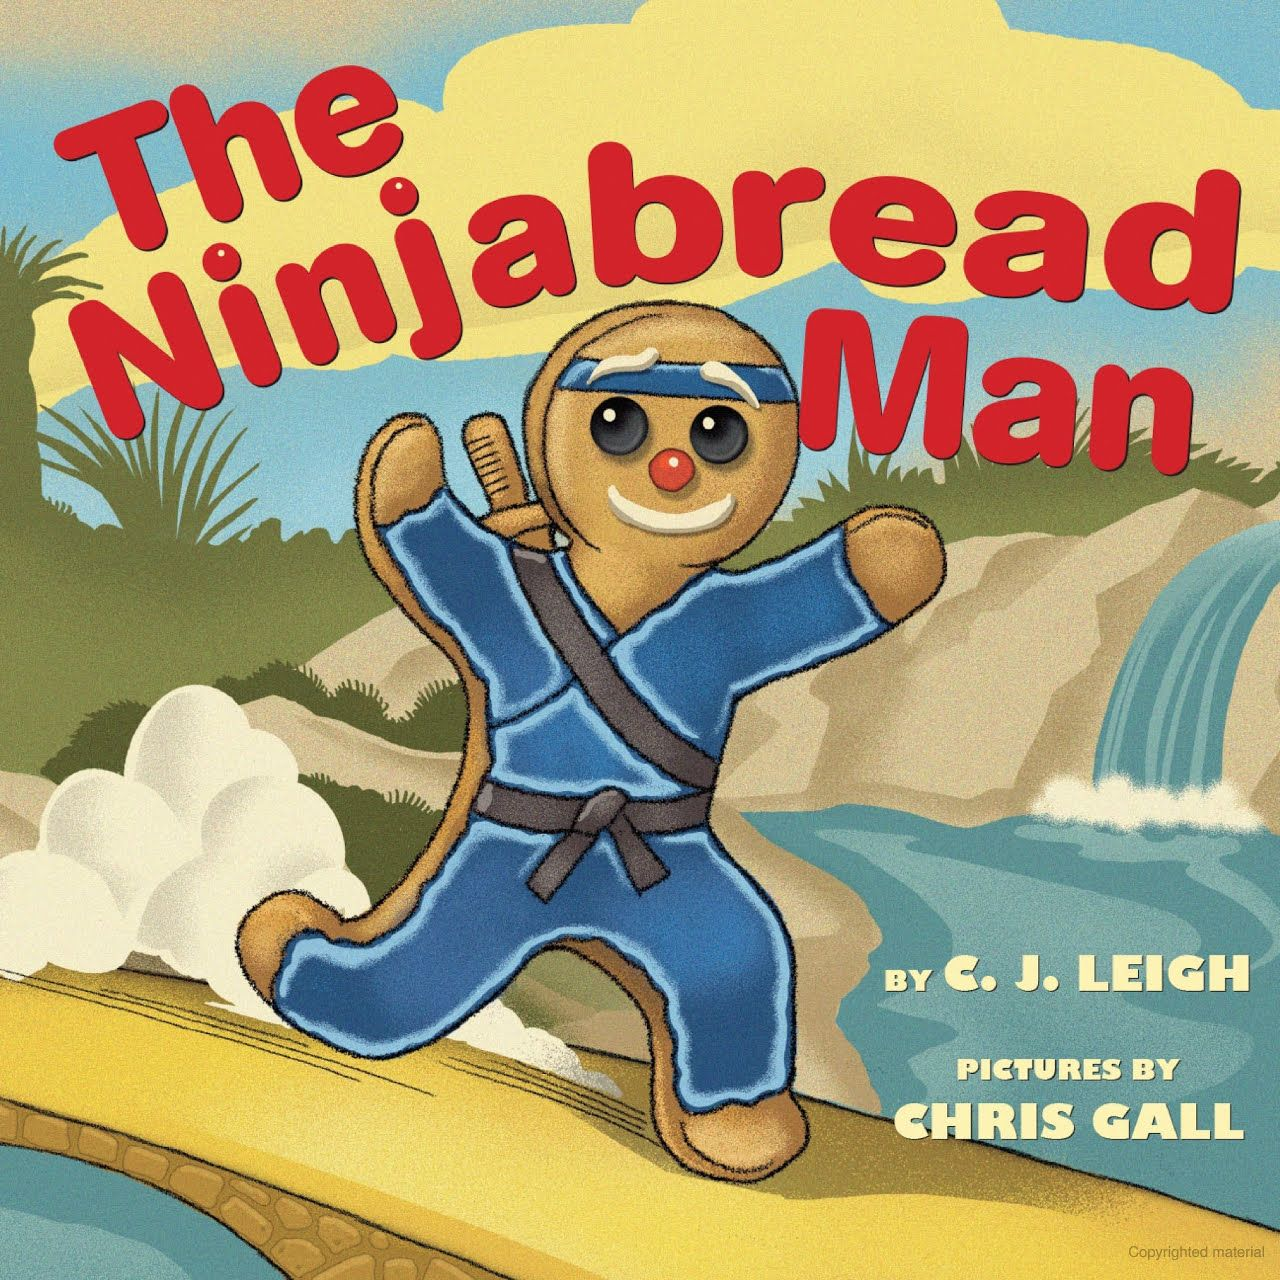 The Ninjabread Man Gingerbread man story